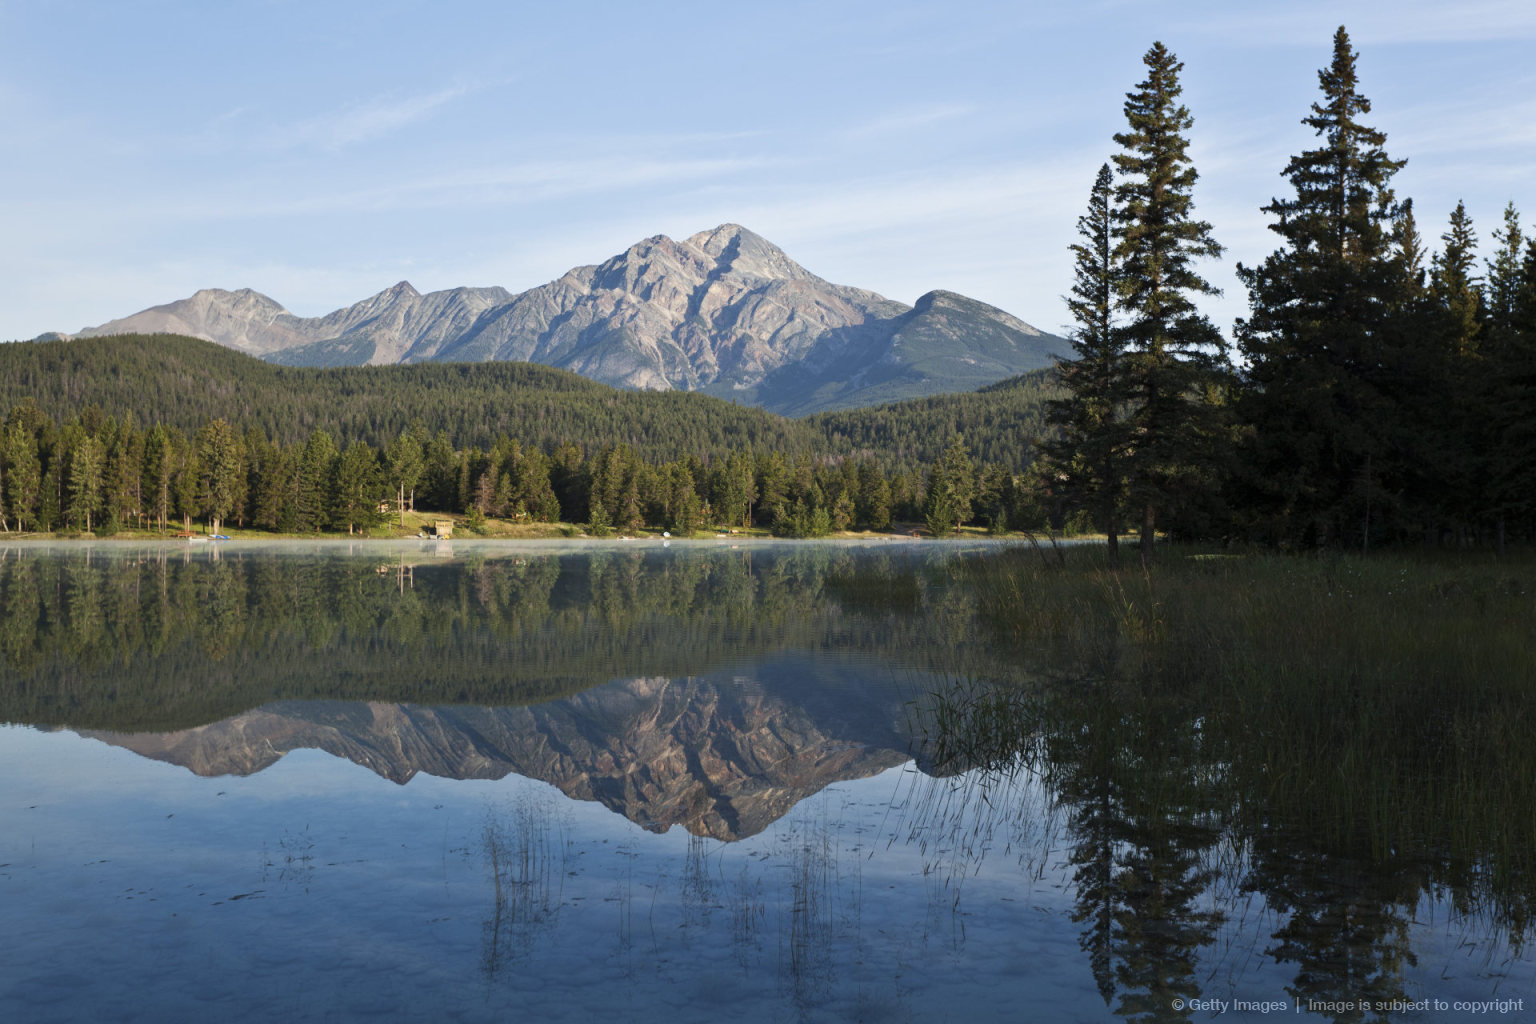 Pyramid Mountain and Lake Edith, Jasper National Park, Alberta, Canada